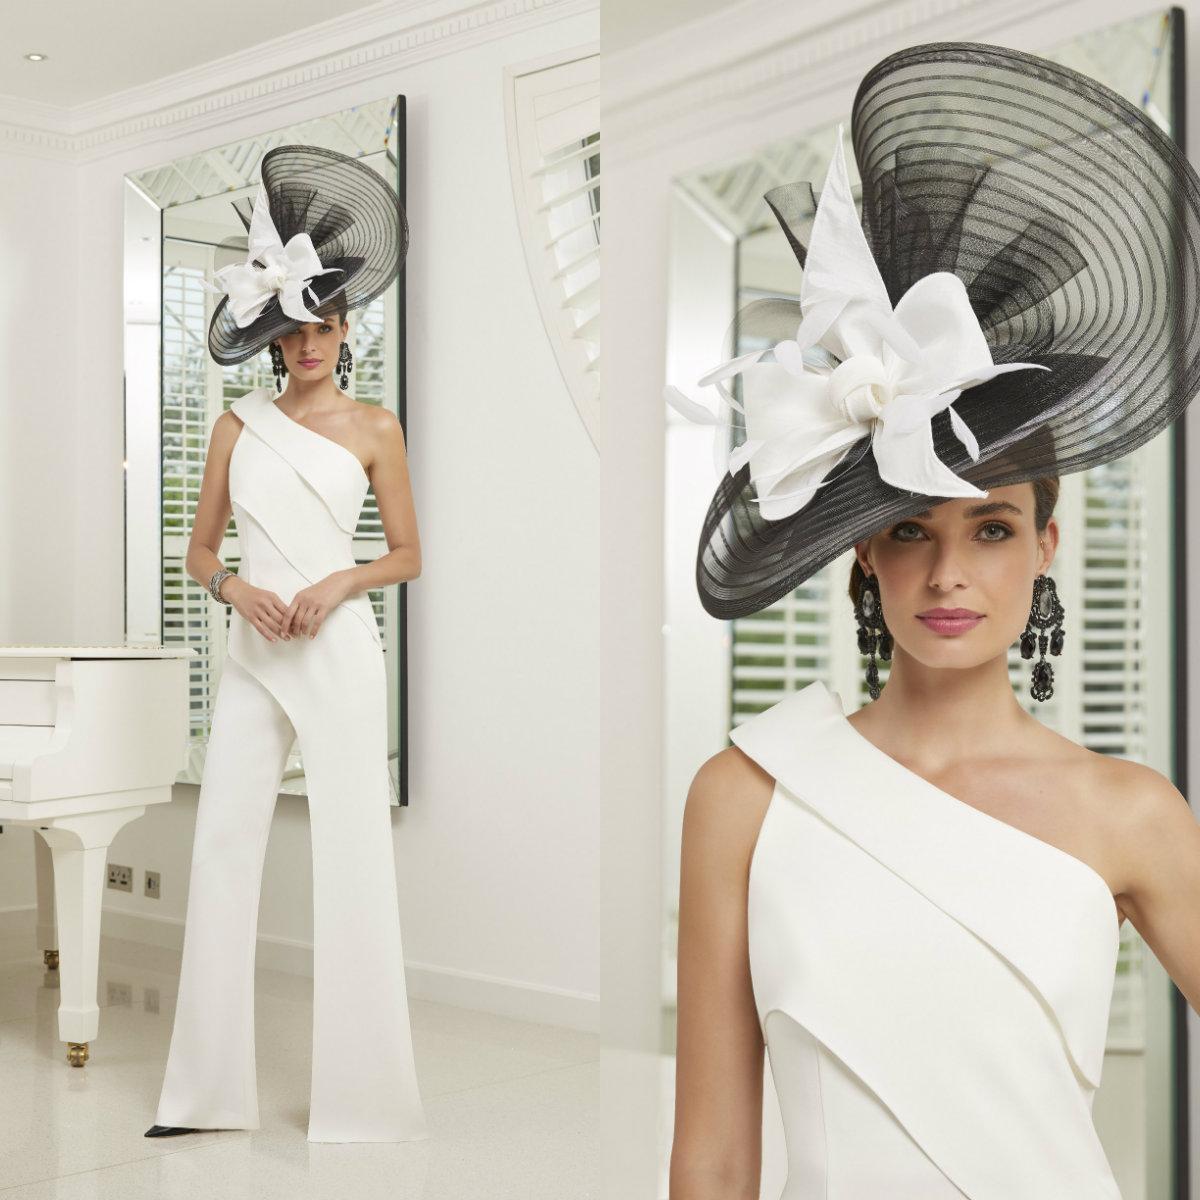 2020 New Jumpsuits Mother Of The Bride Dresses One Shoulder Pants Suit Tieres Wedding Guest Dress Elegant Evening Gowns